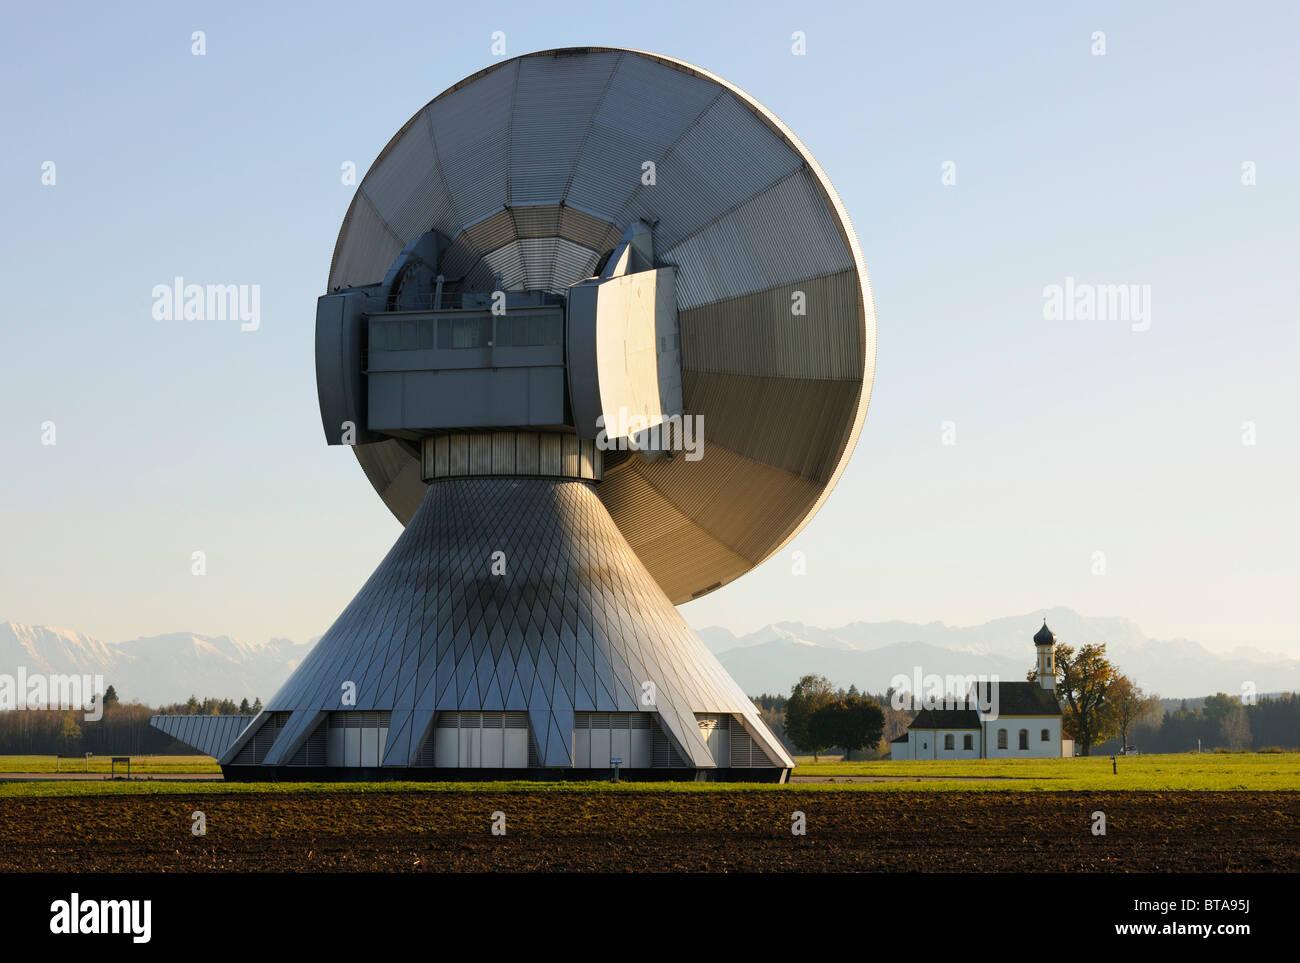 Earth station, parabolic aerial, pilgrimage church St. Johannes, Raisting, Bavaria, Germany, Europe Stock Photo